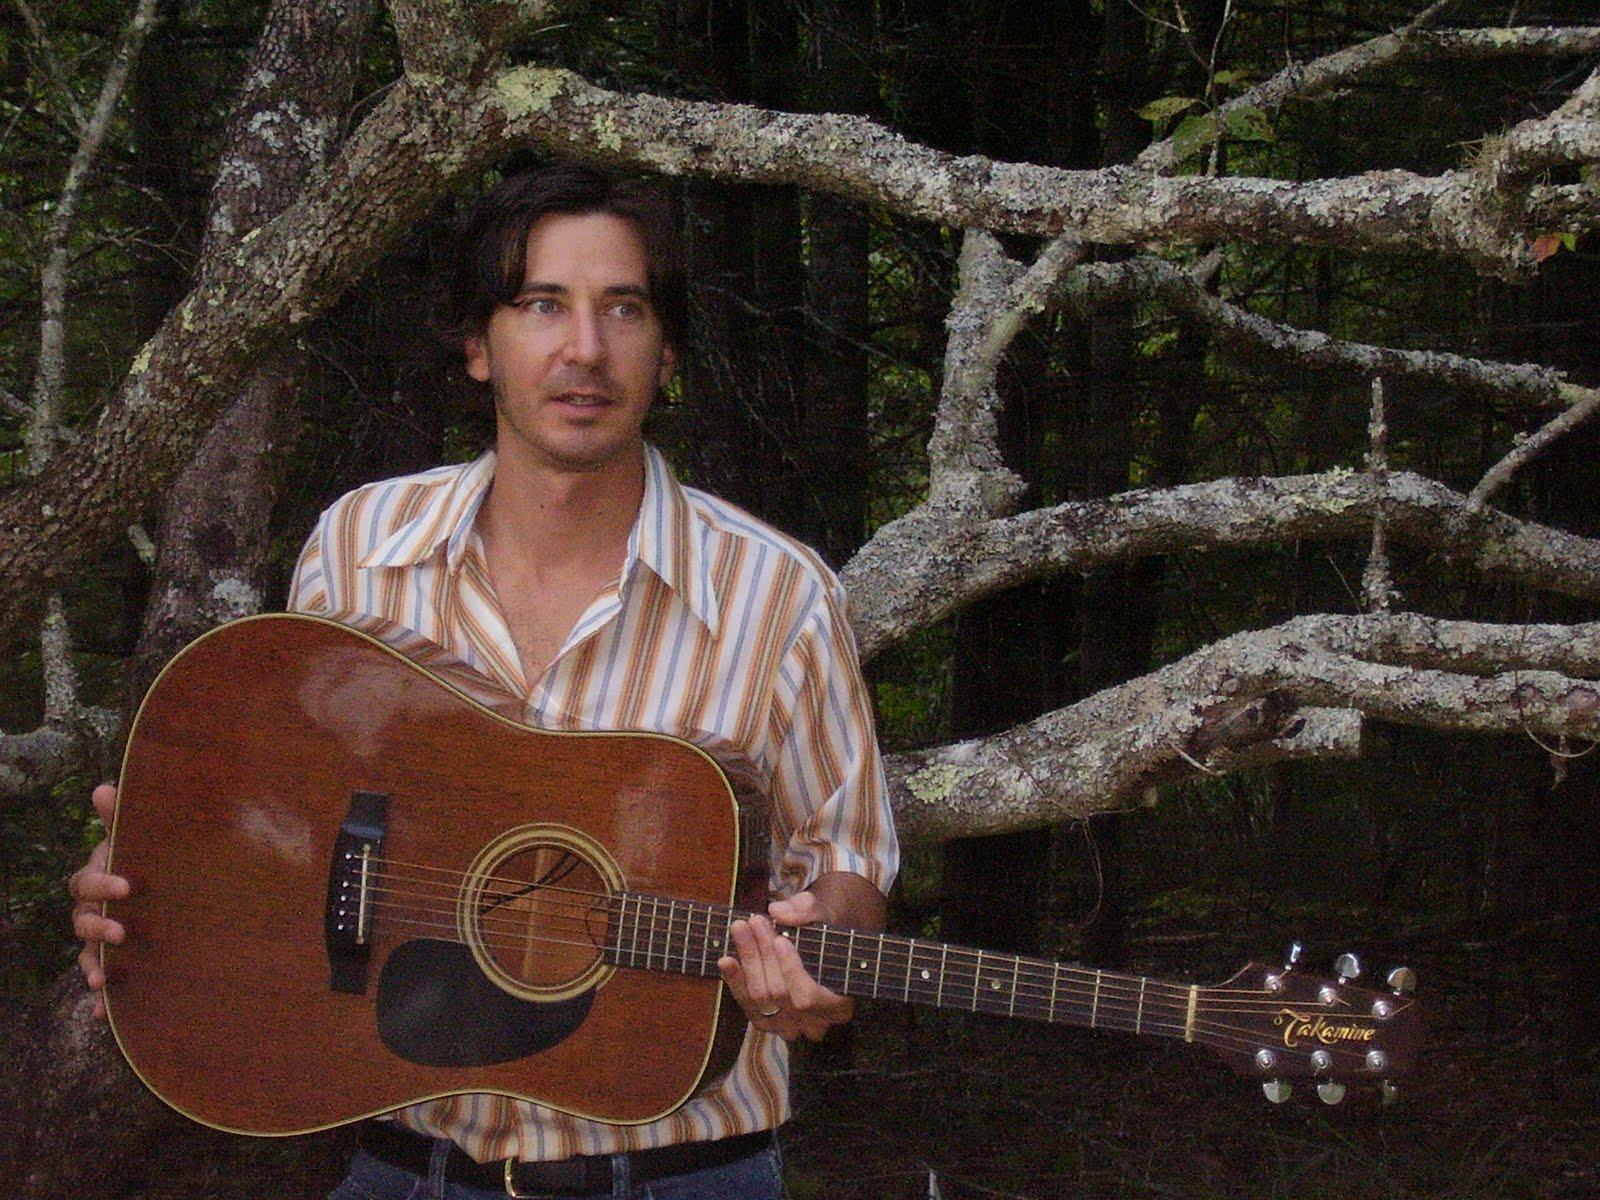 http://4.bp.blogspot.com/_FXmV6HgiK_k/SxWyQSL3yNI/AAAAAAAAIps/7rcpWQ1AcB0/s1600/Dave+Desmelik.jpg